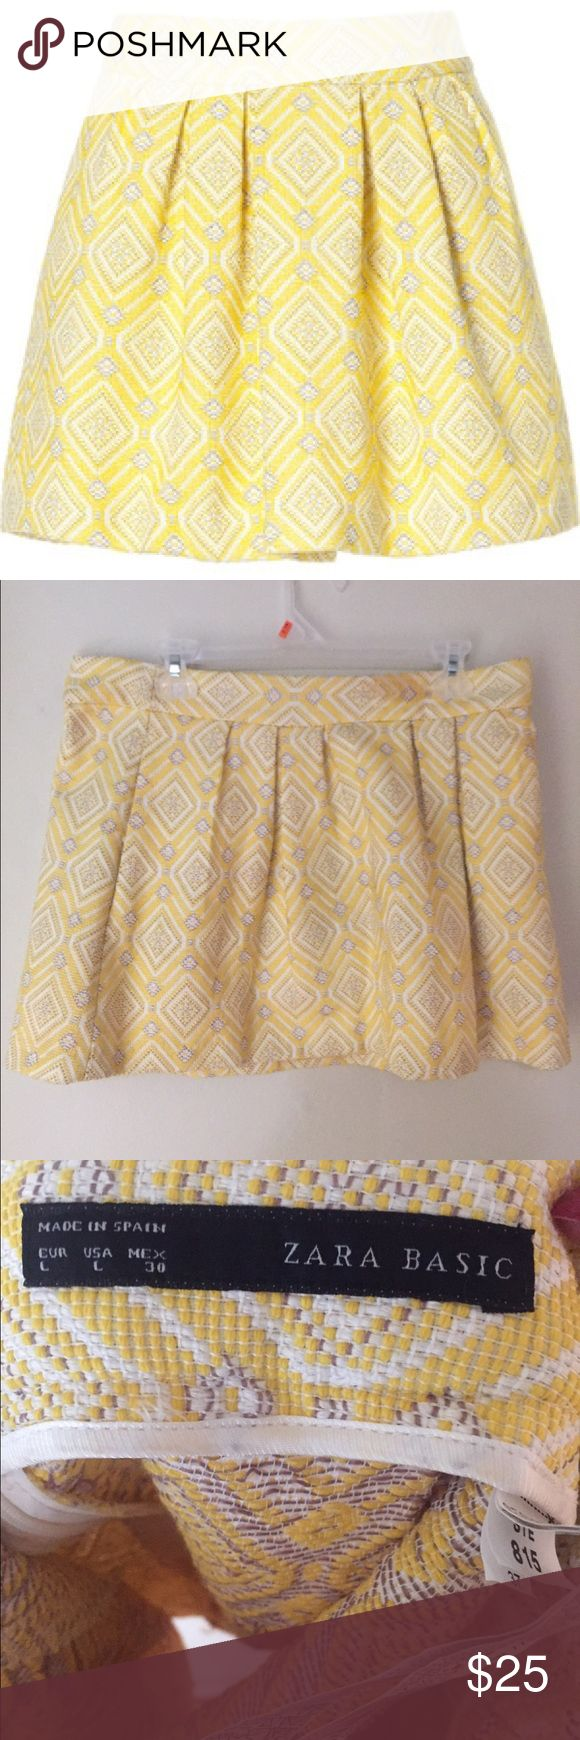 Zara pleated Jacquard skirt NWOT! Never worn Zara skirt. Falls to right above knee length. Beautifully woven skirt, with amazing detail! Size Large. Zara Skirts